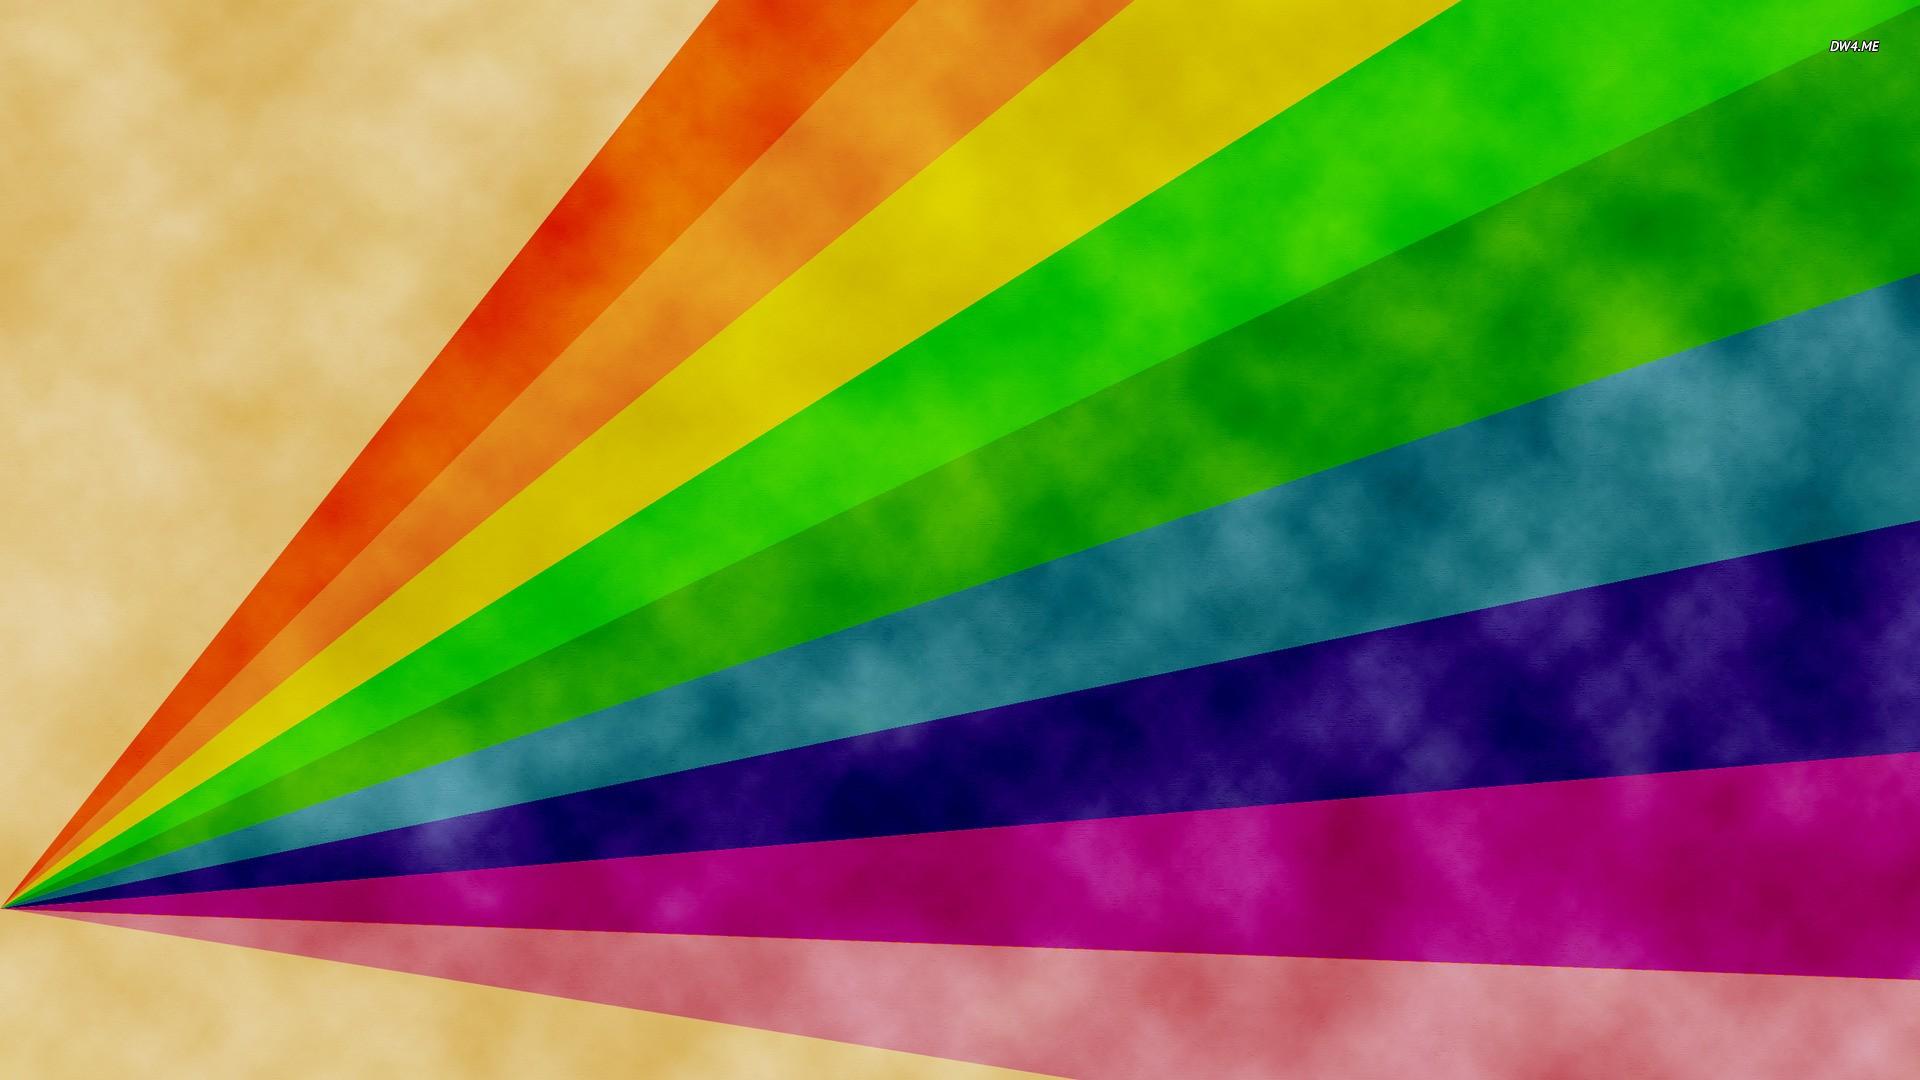 Rainbow Wallpaper ·① Download Free Stunning Full HD